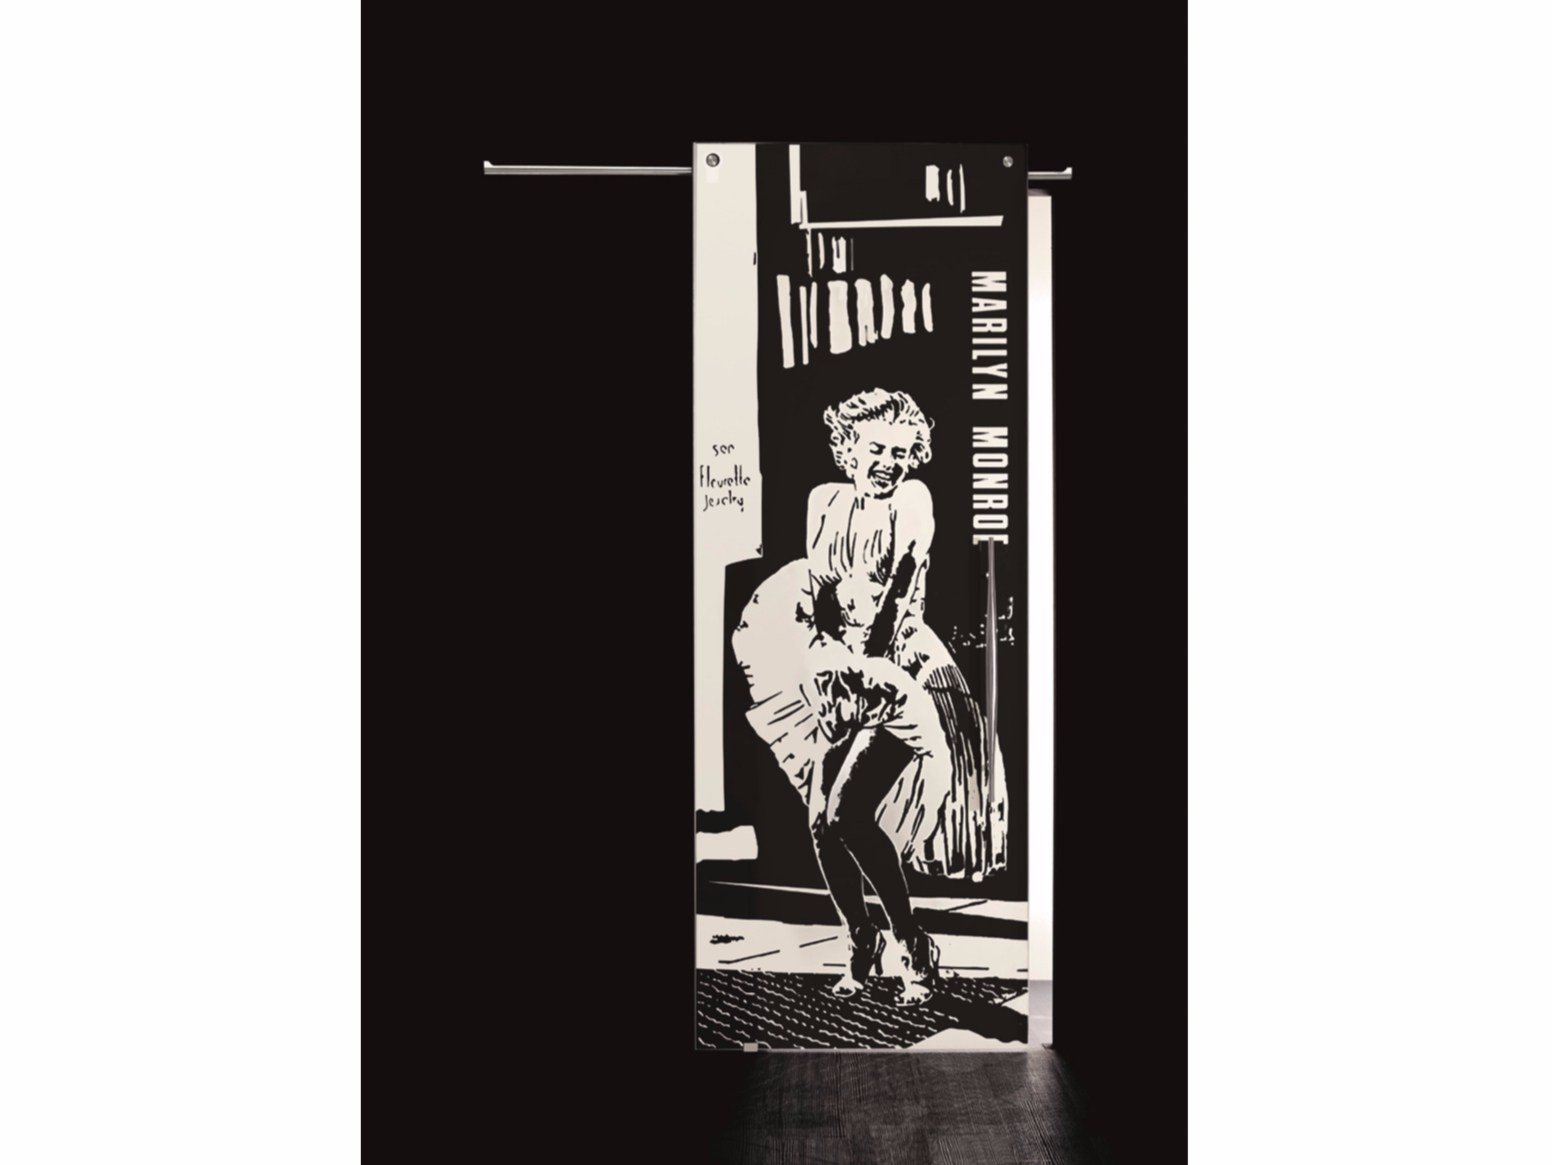 porta scorrevole in vetro audrey hepburn by casali - Porte In Vetro Scorrevoli Per Interni Casali